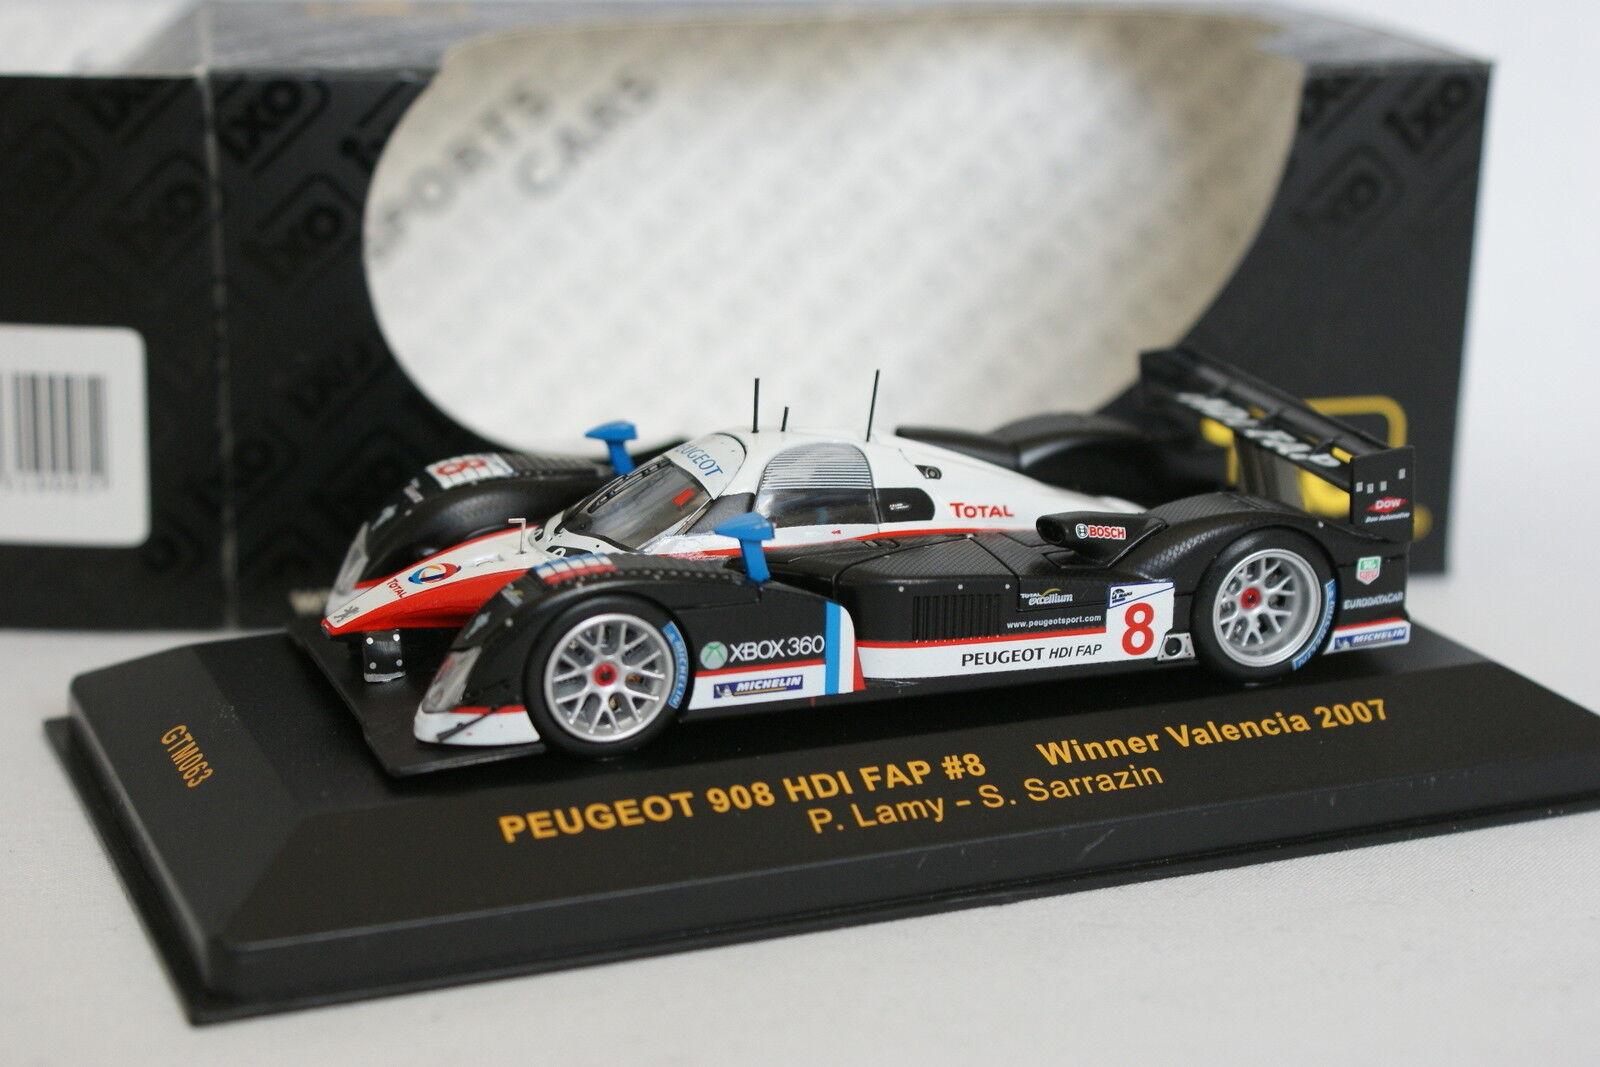 Ixo 1 43 - Peugeot 908 HDI FAP WINNER Valencia 2007